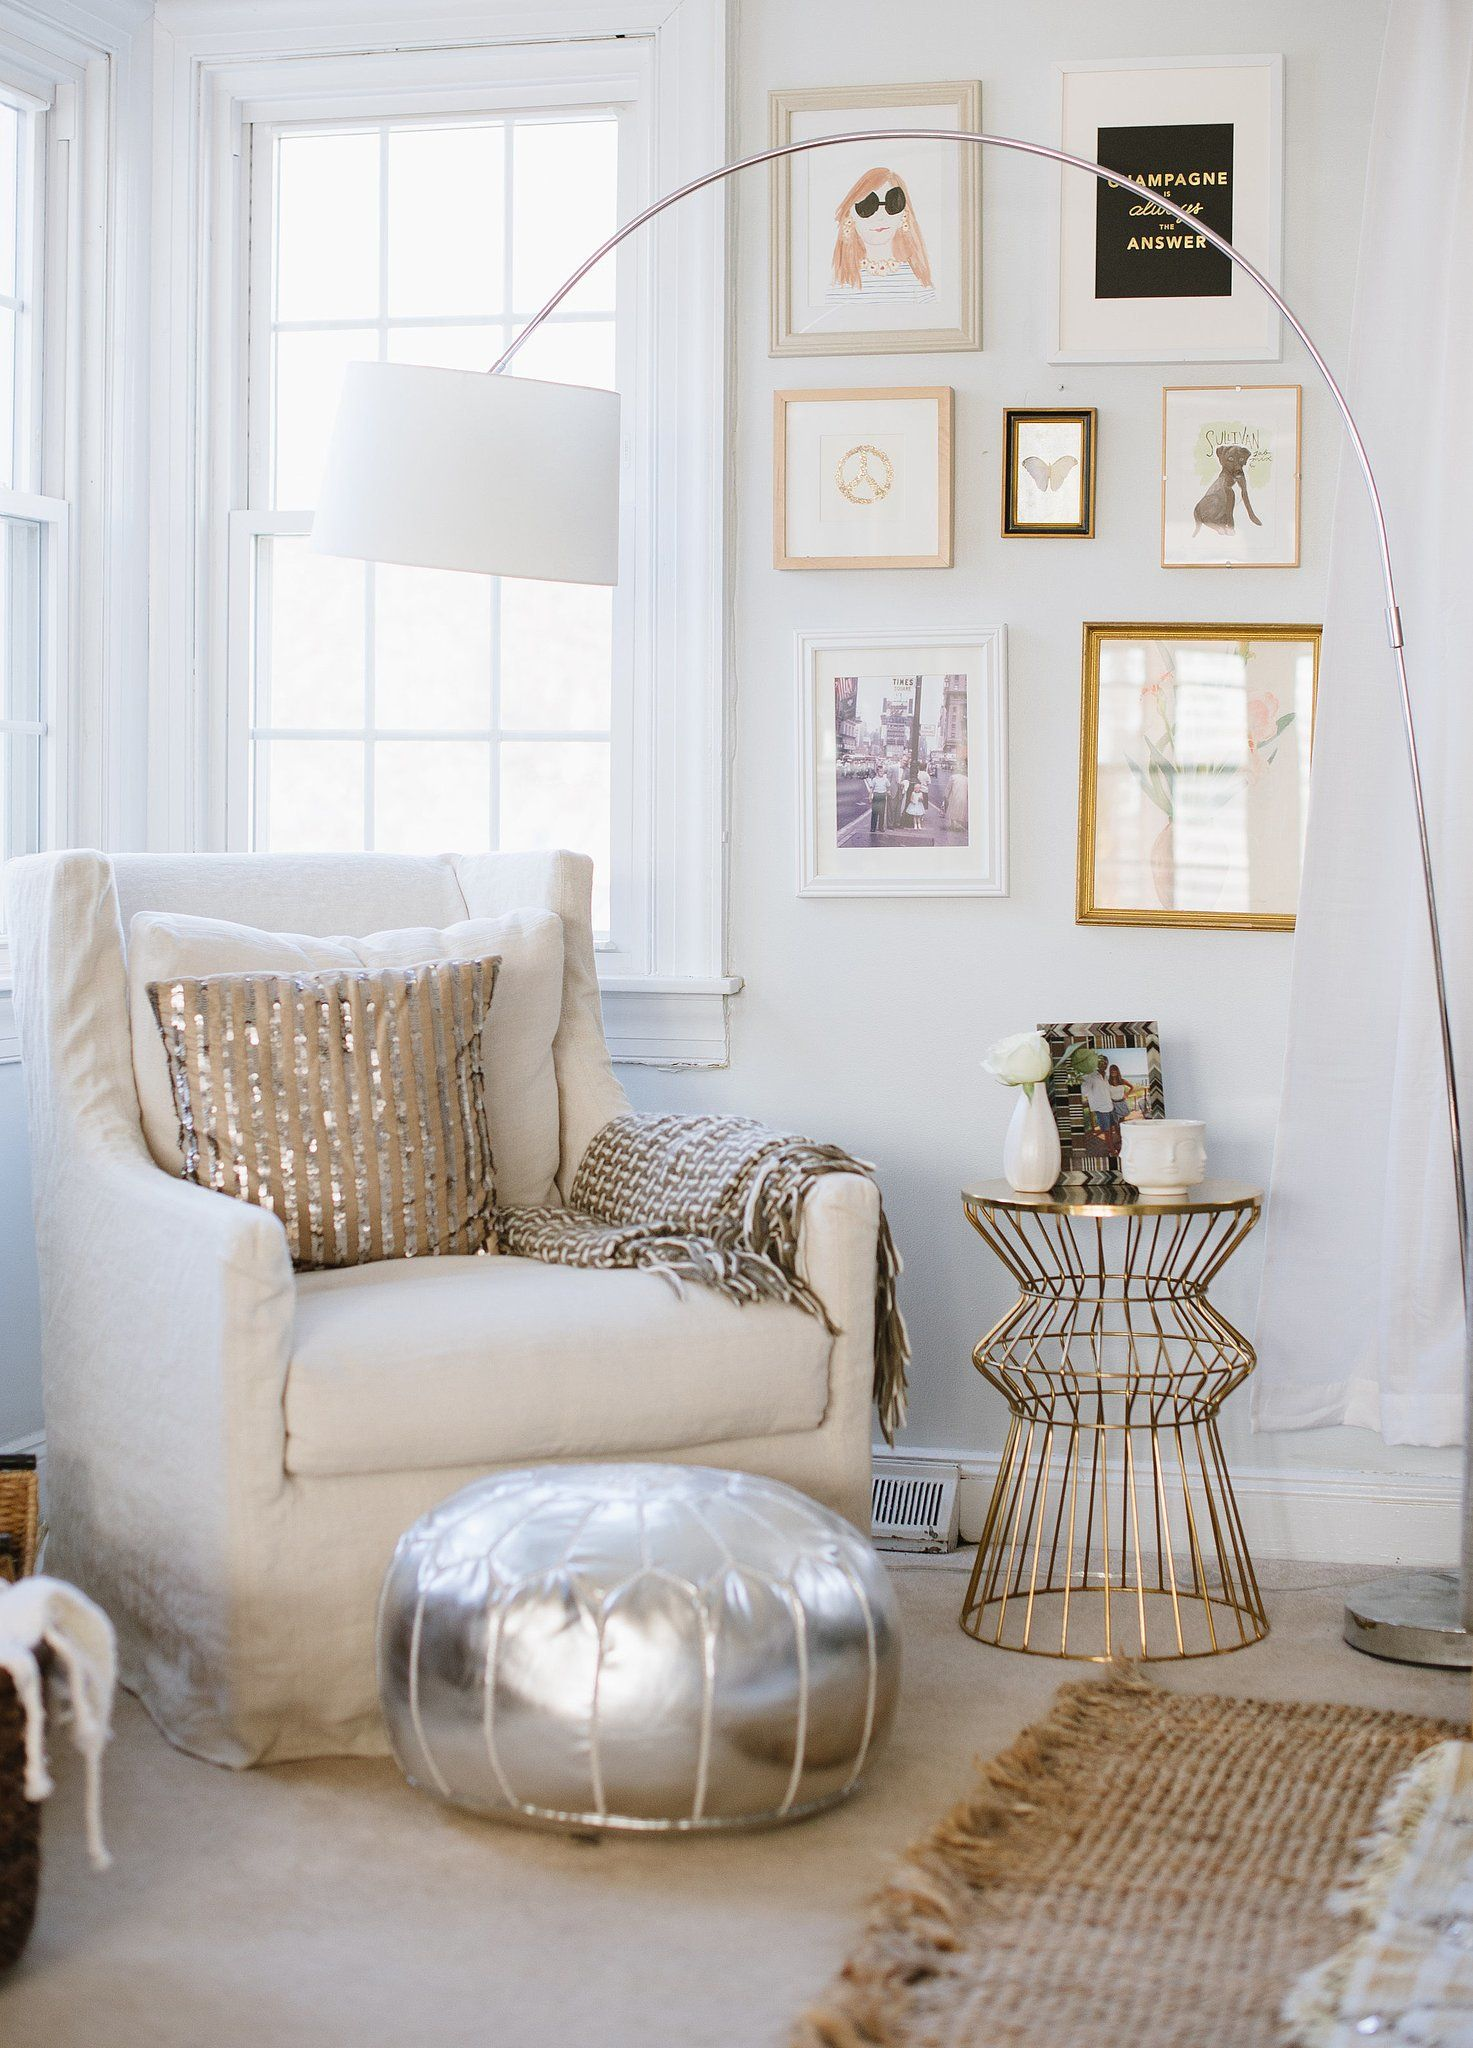 Lovely reading nook #interiors #contemporaryfurniture #homedecor #furniture #homeinspiration http://www.sierralivingconcepts.com/